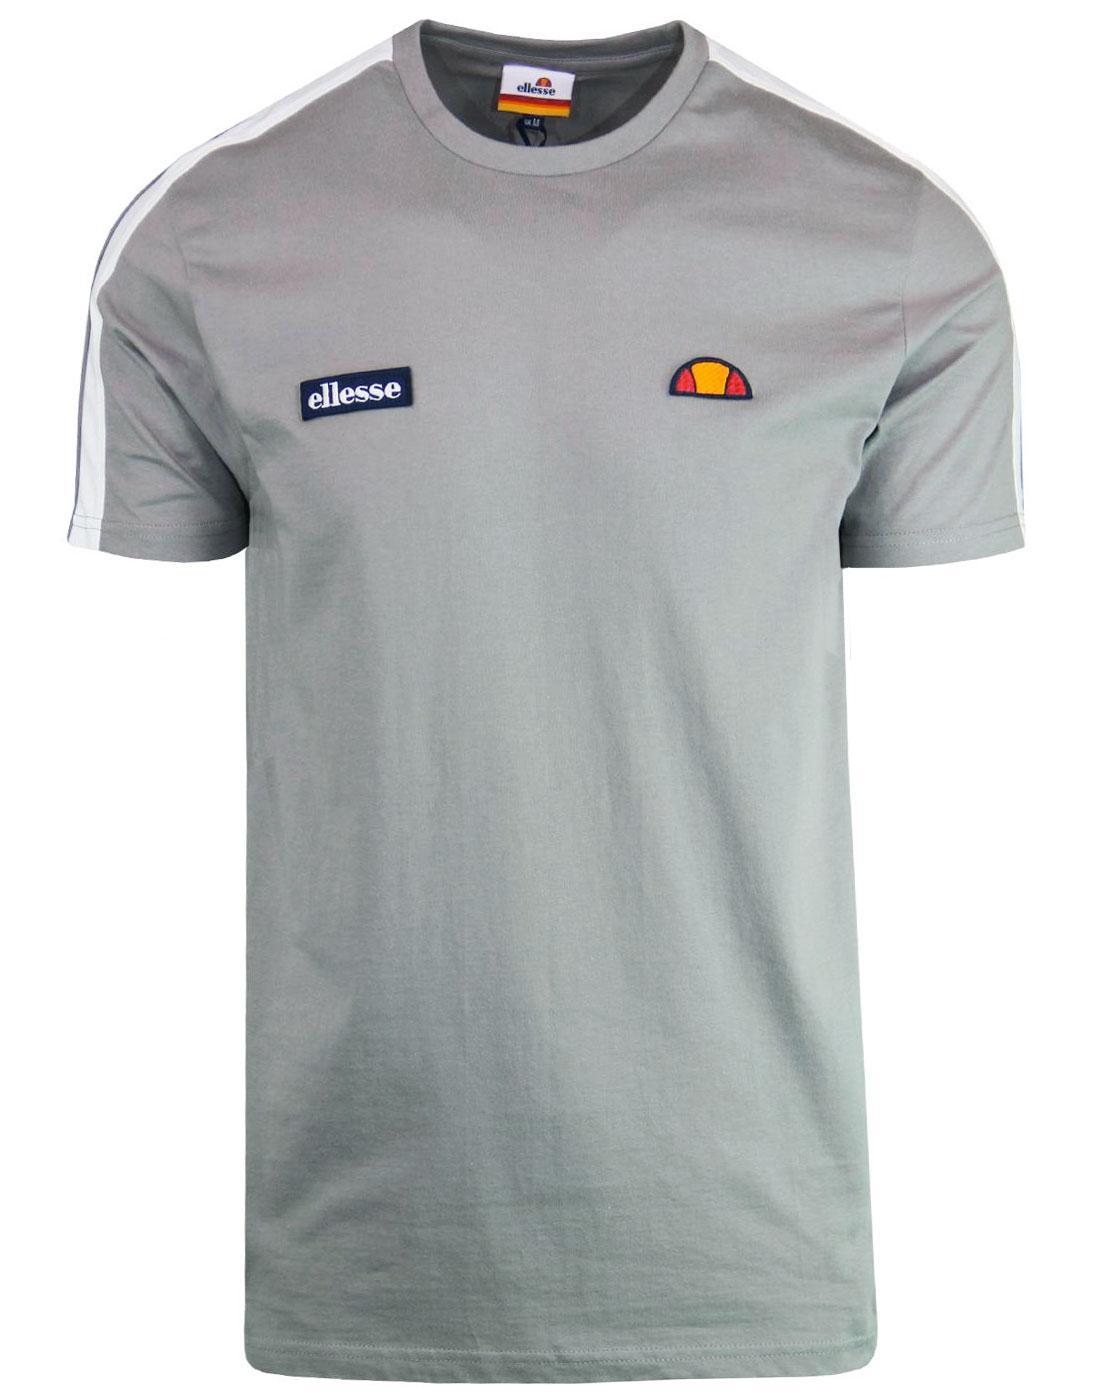 Crotone ELLESSE Retro 80s Stripe Sleeve T-shirt FG